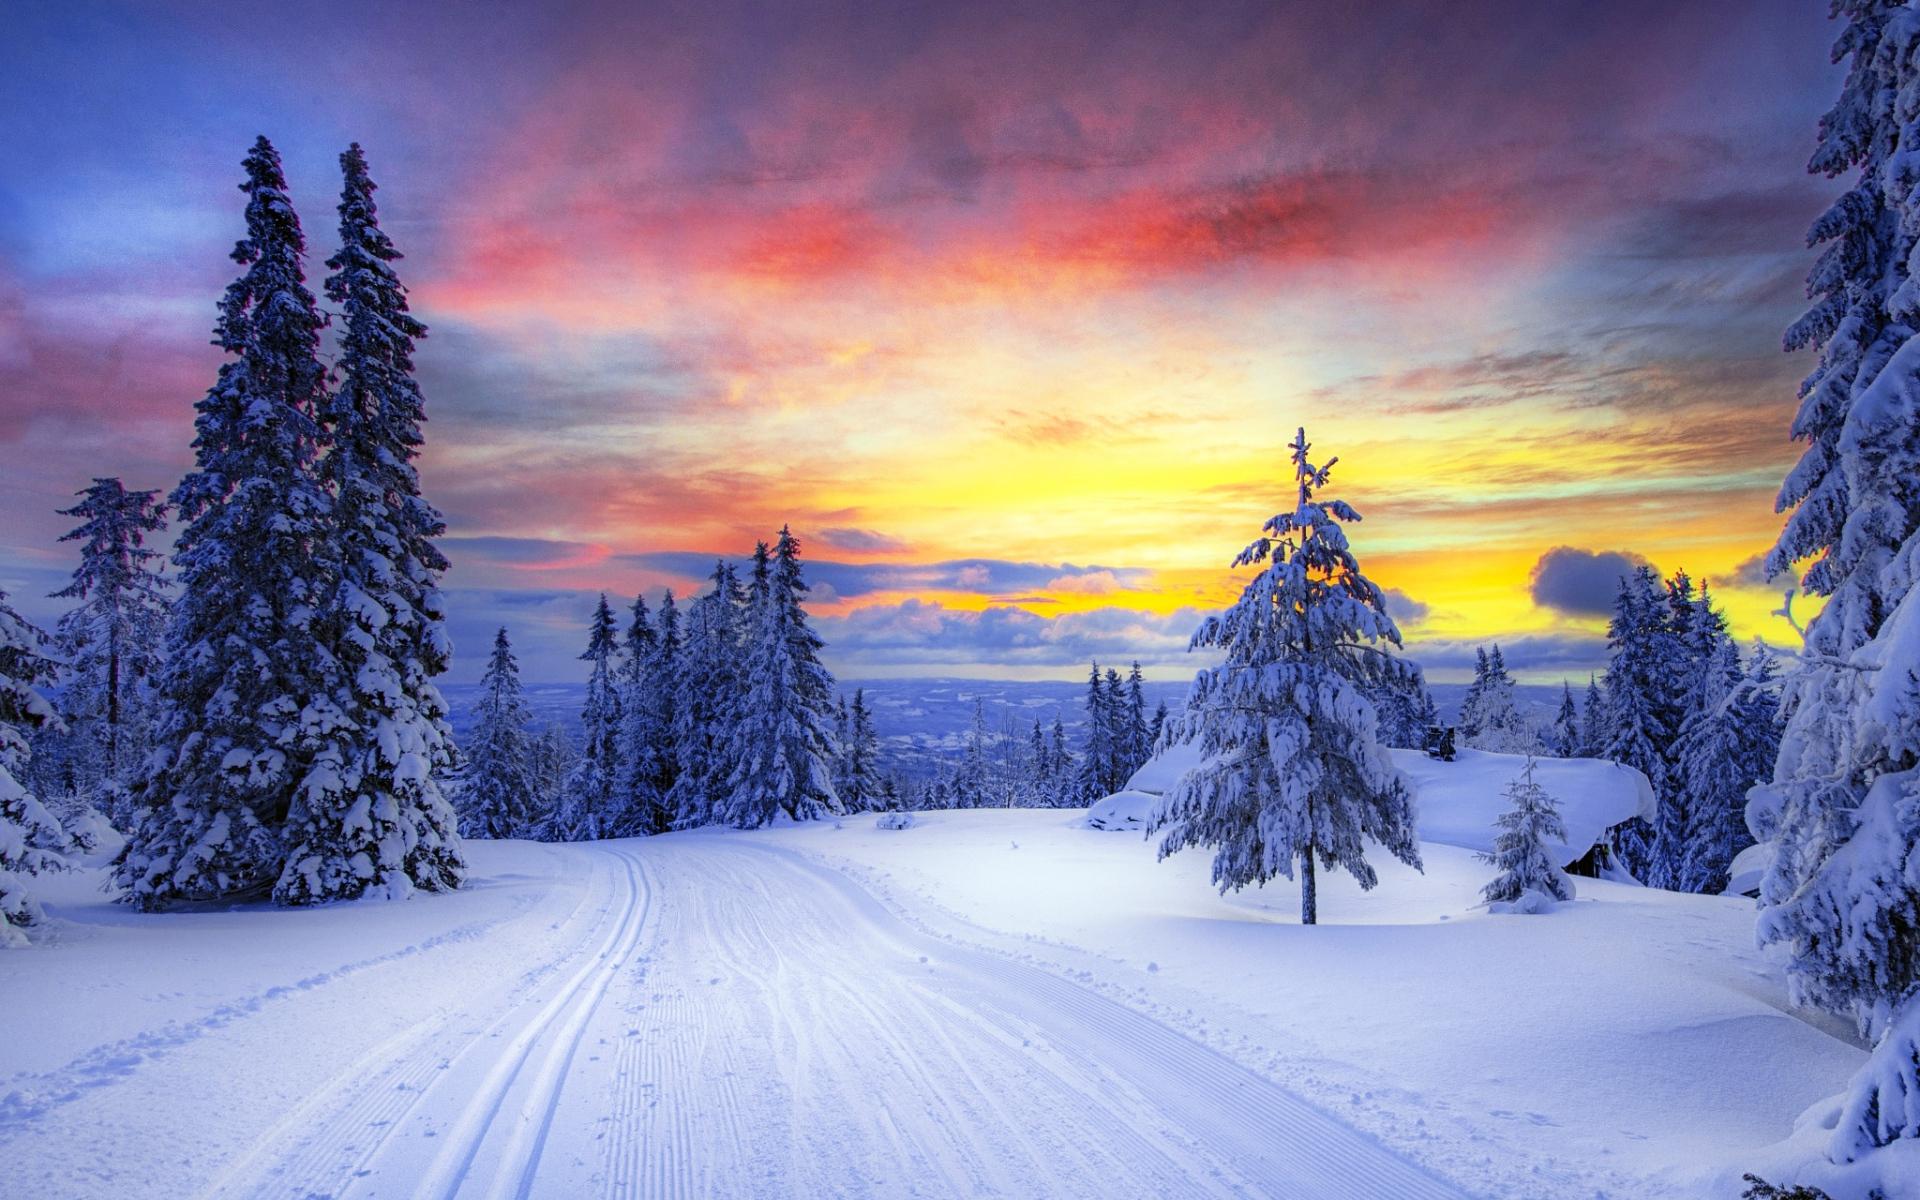 Snowy Sunset Wallpaper Wallpapersafari